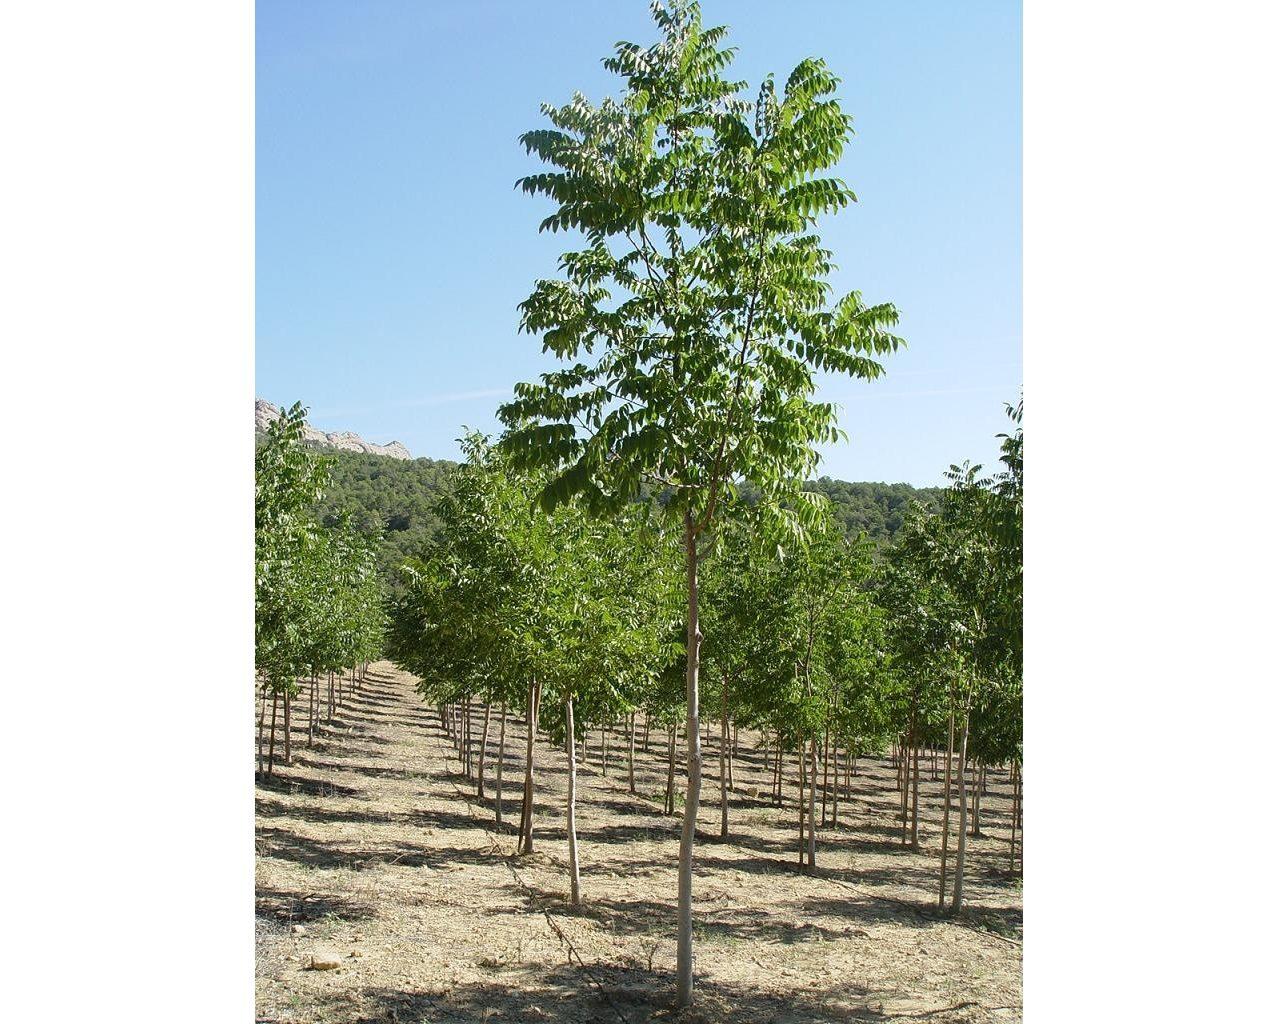 walnut wood production